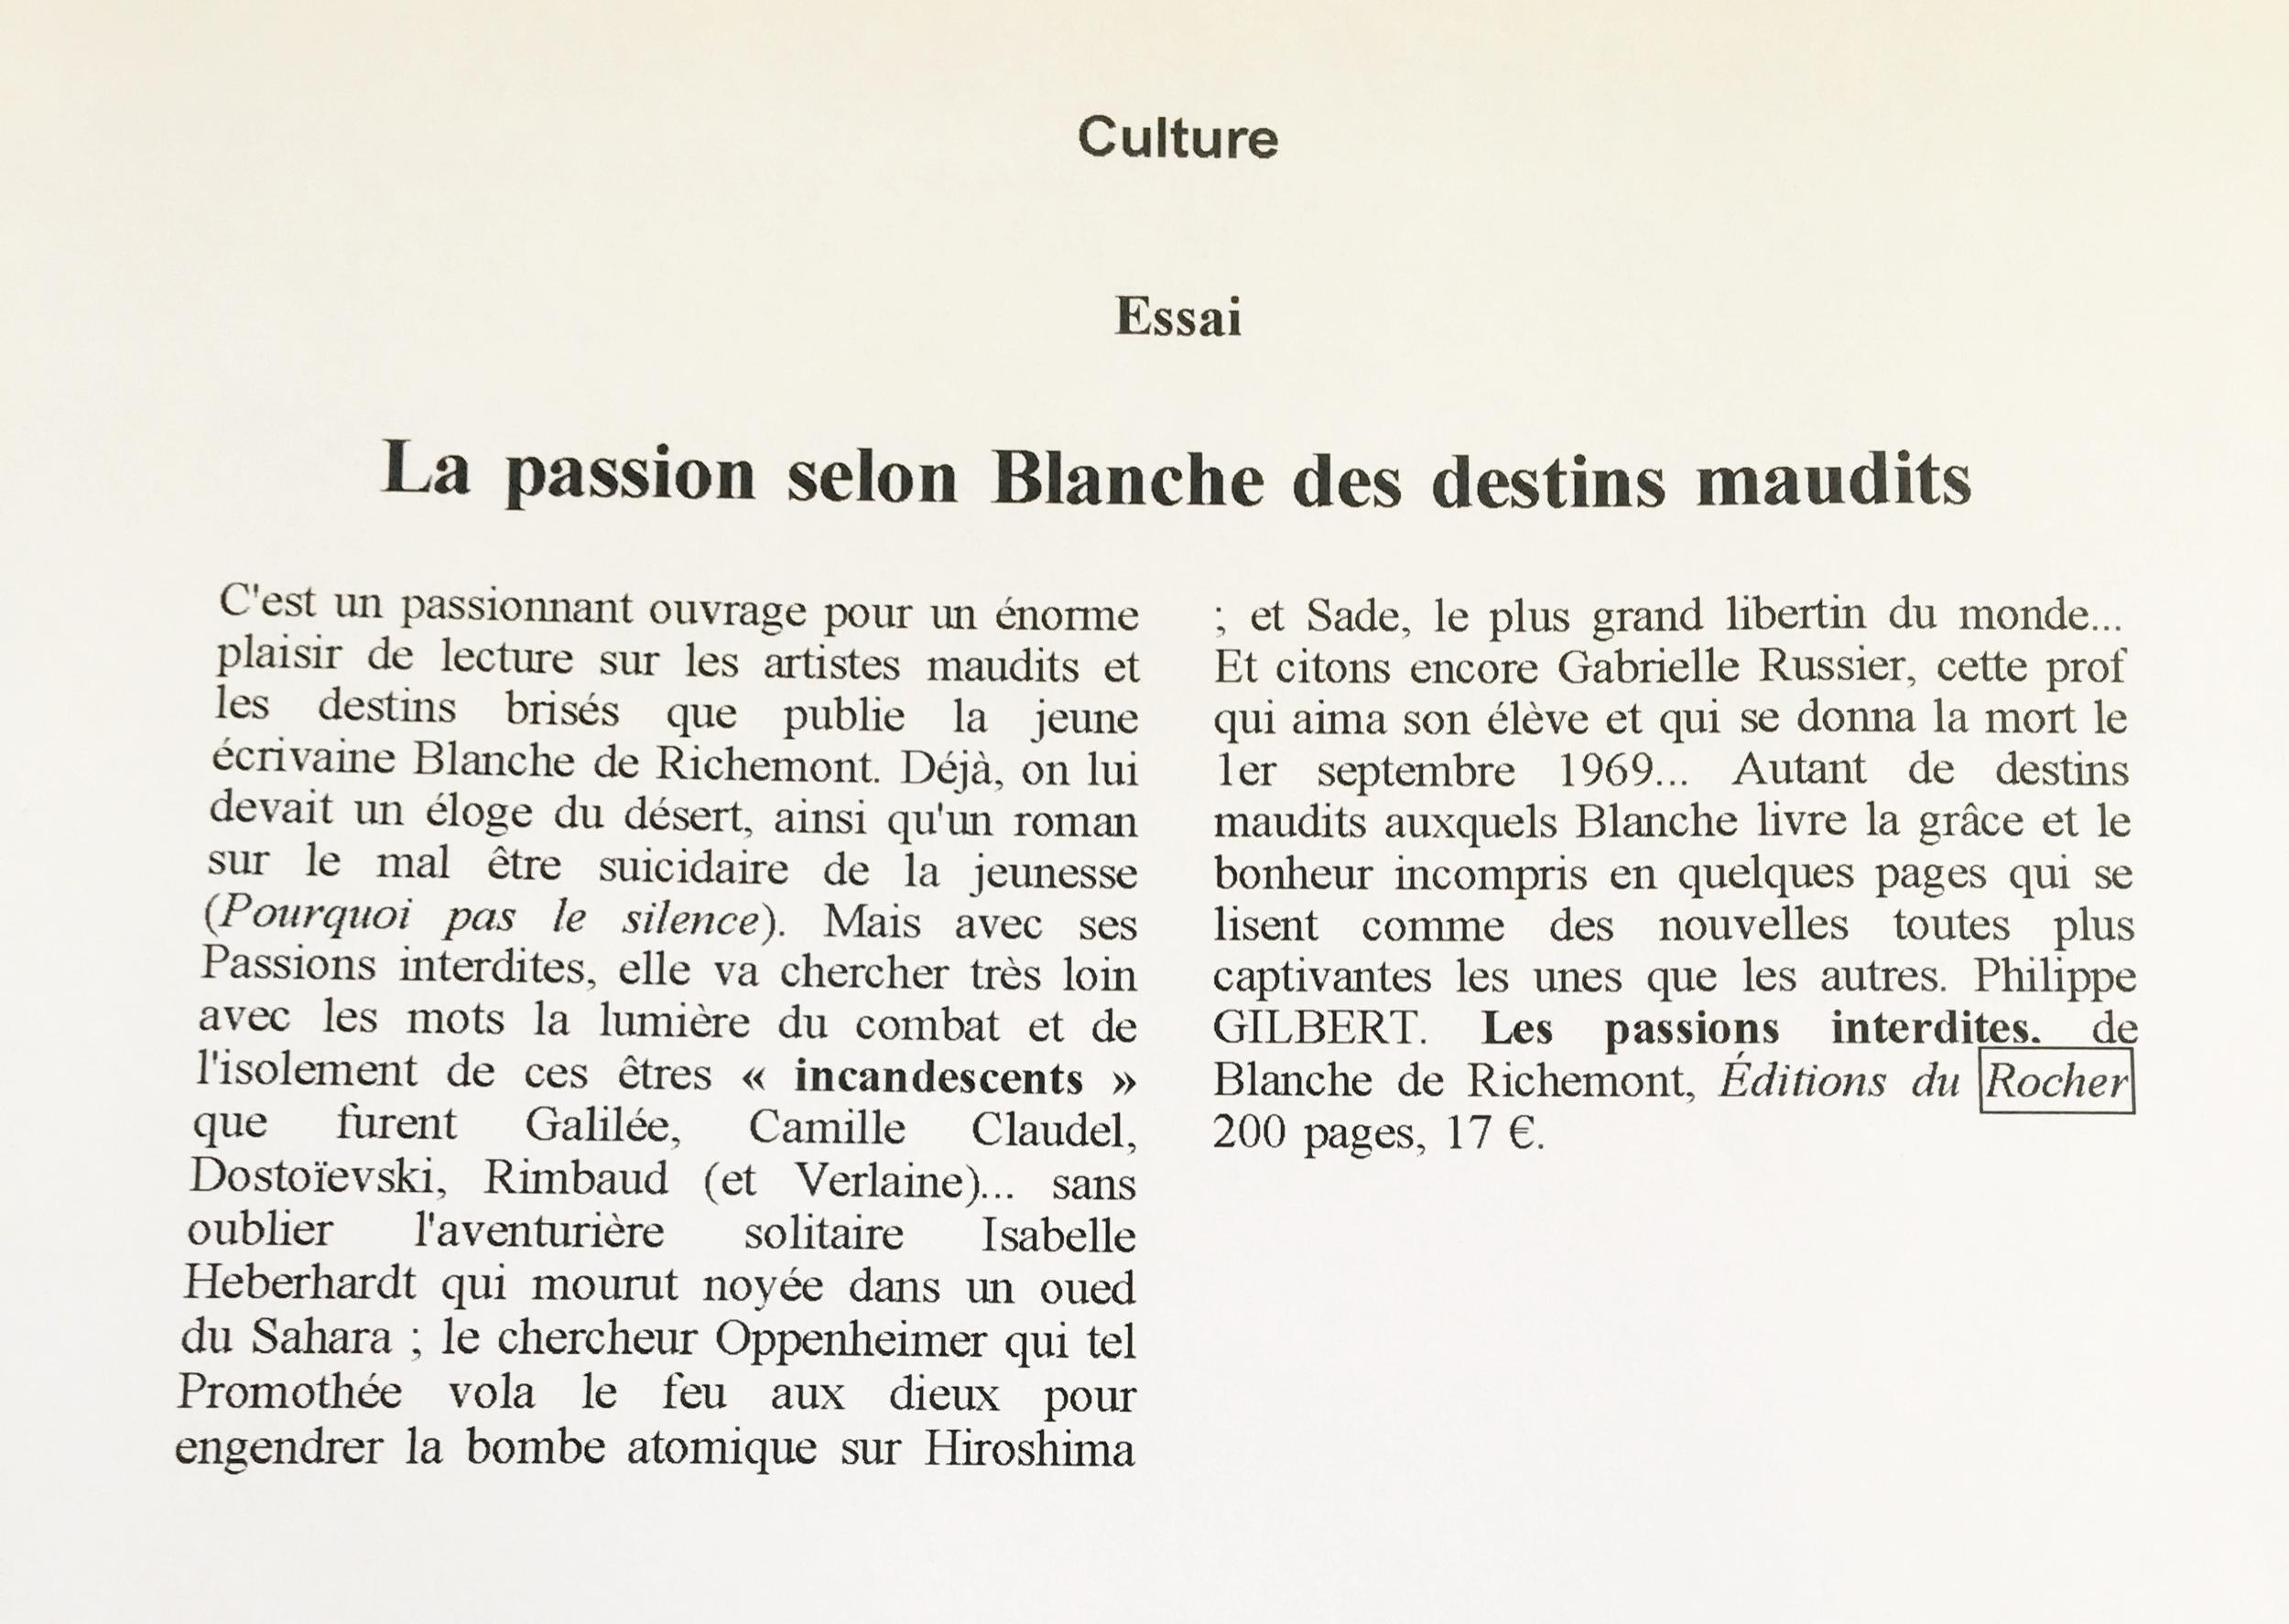 Passions interdites. Ouest France. Juin 2009